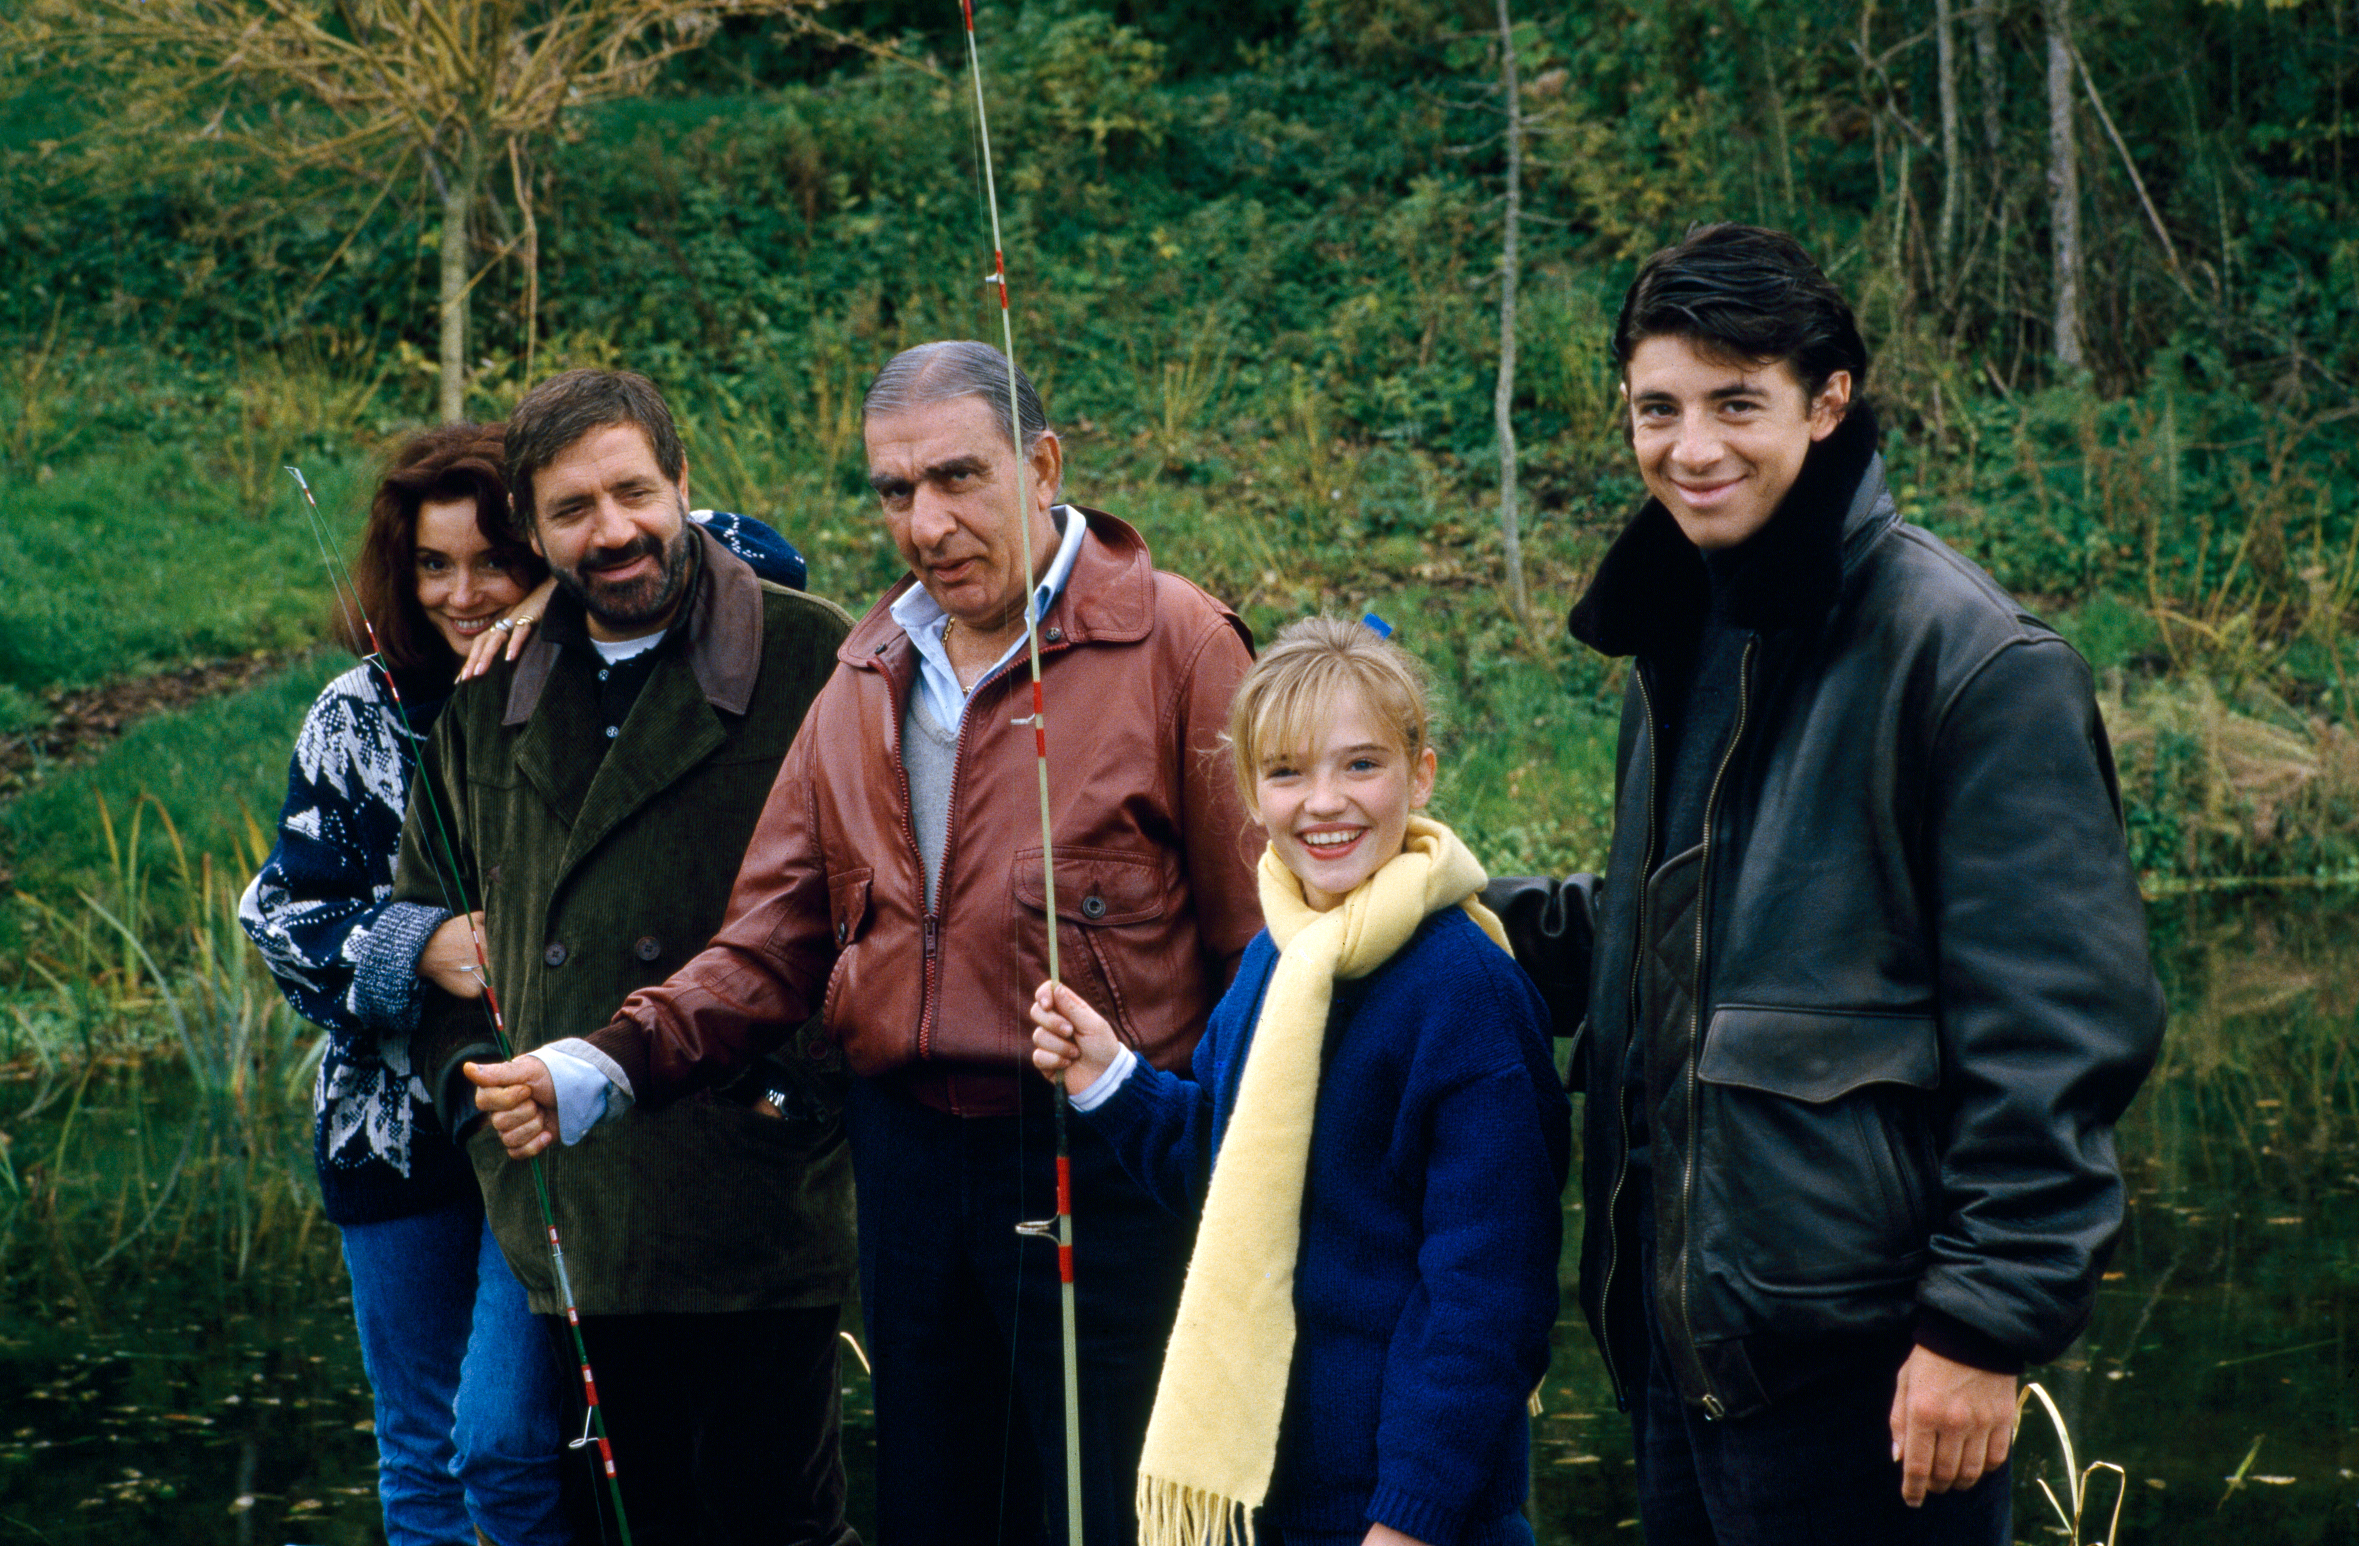 Patrick Bruel, Edwige Navarro, Charles Gérard, and Jean Yanne in Attention bandits! (1986)